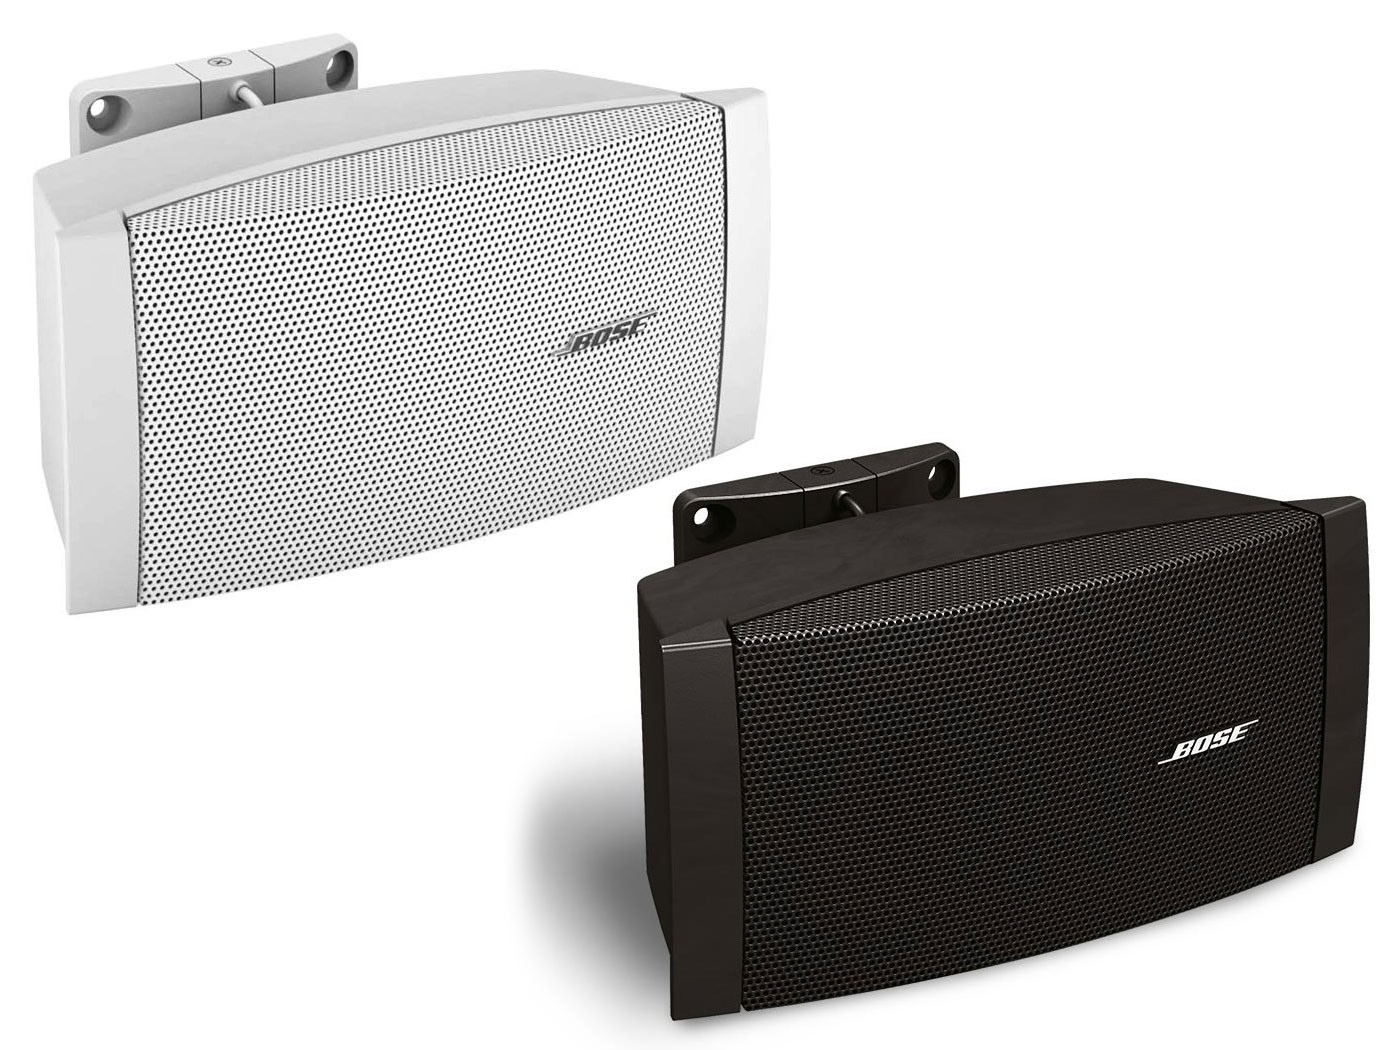 Bose Professional speakers